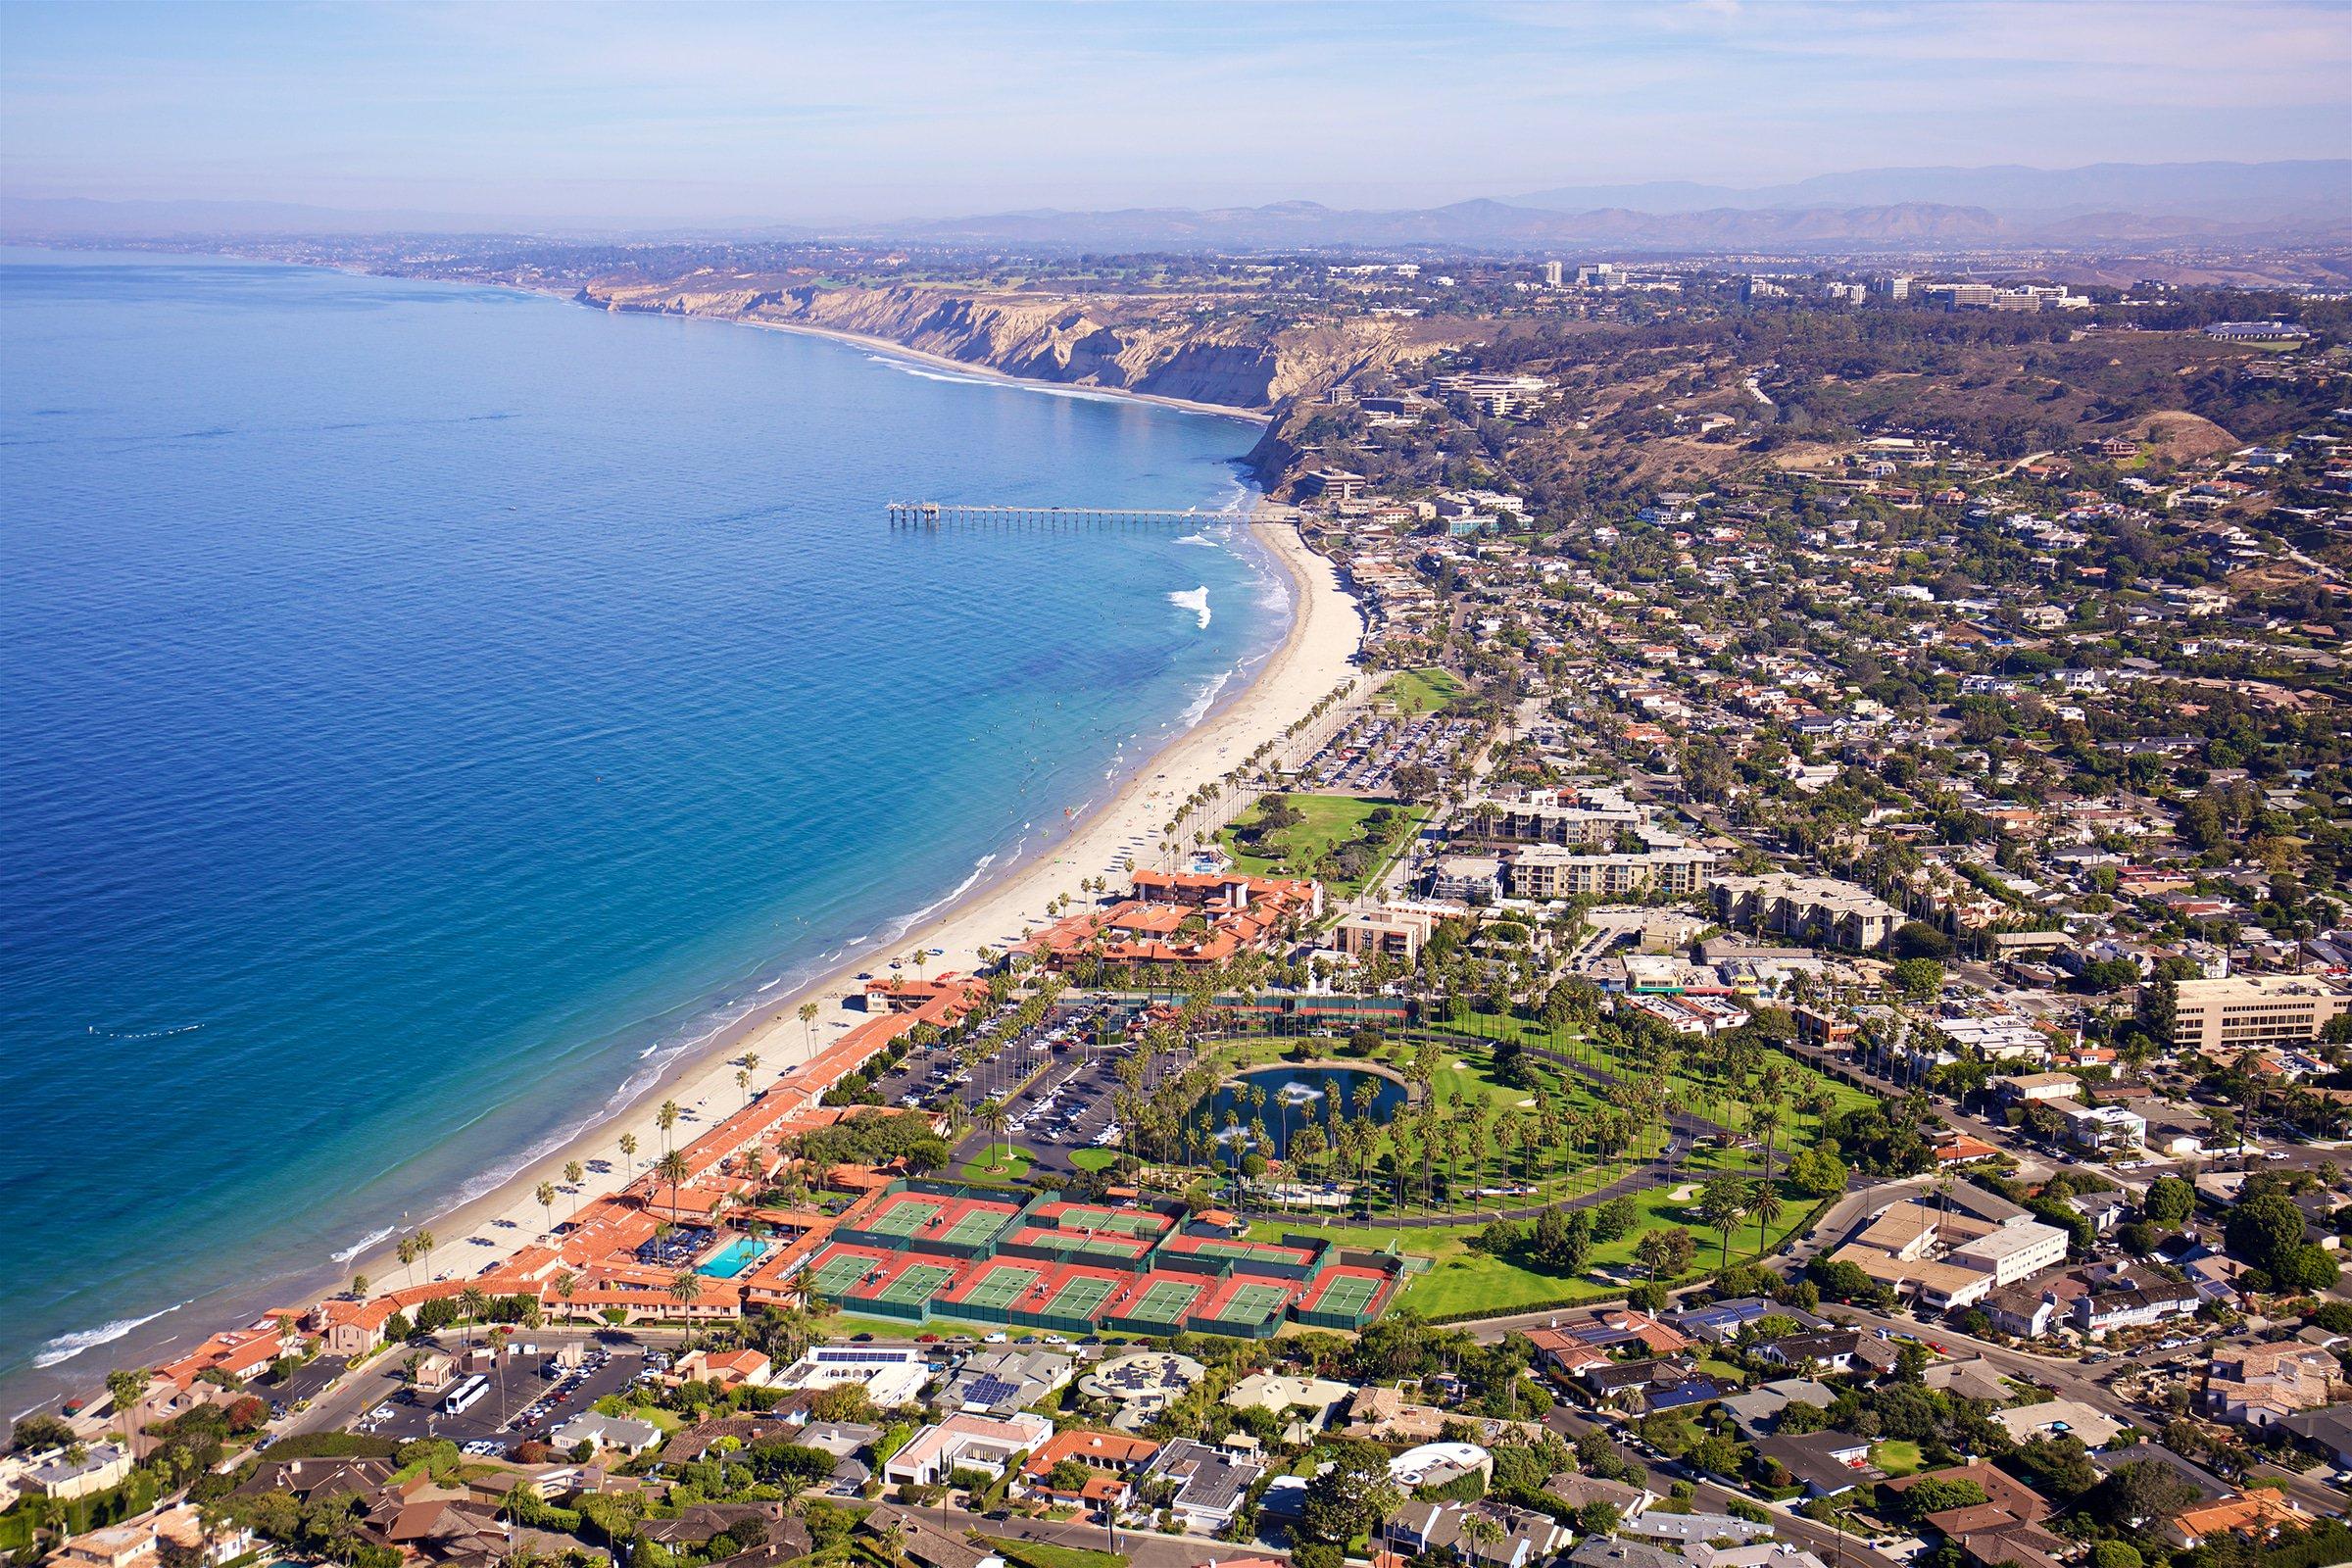 Aerial view of La Jolla Shores neighborhood including LJBTC and La Jolla Shores Hotel